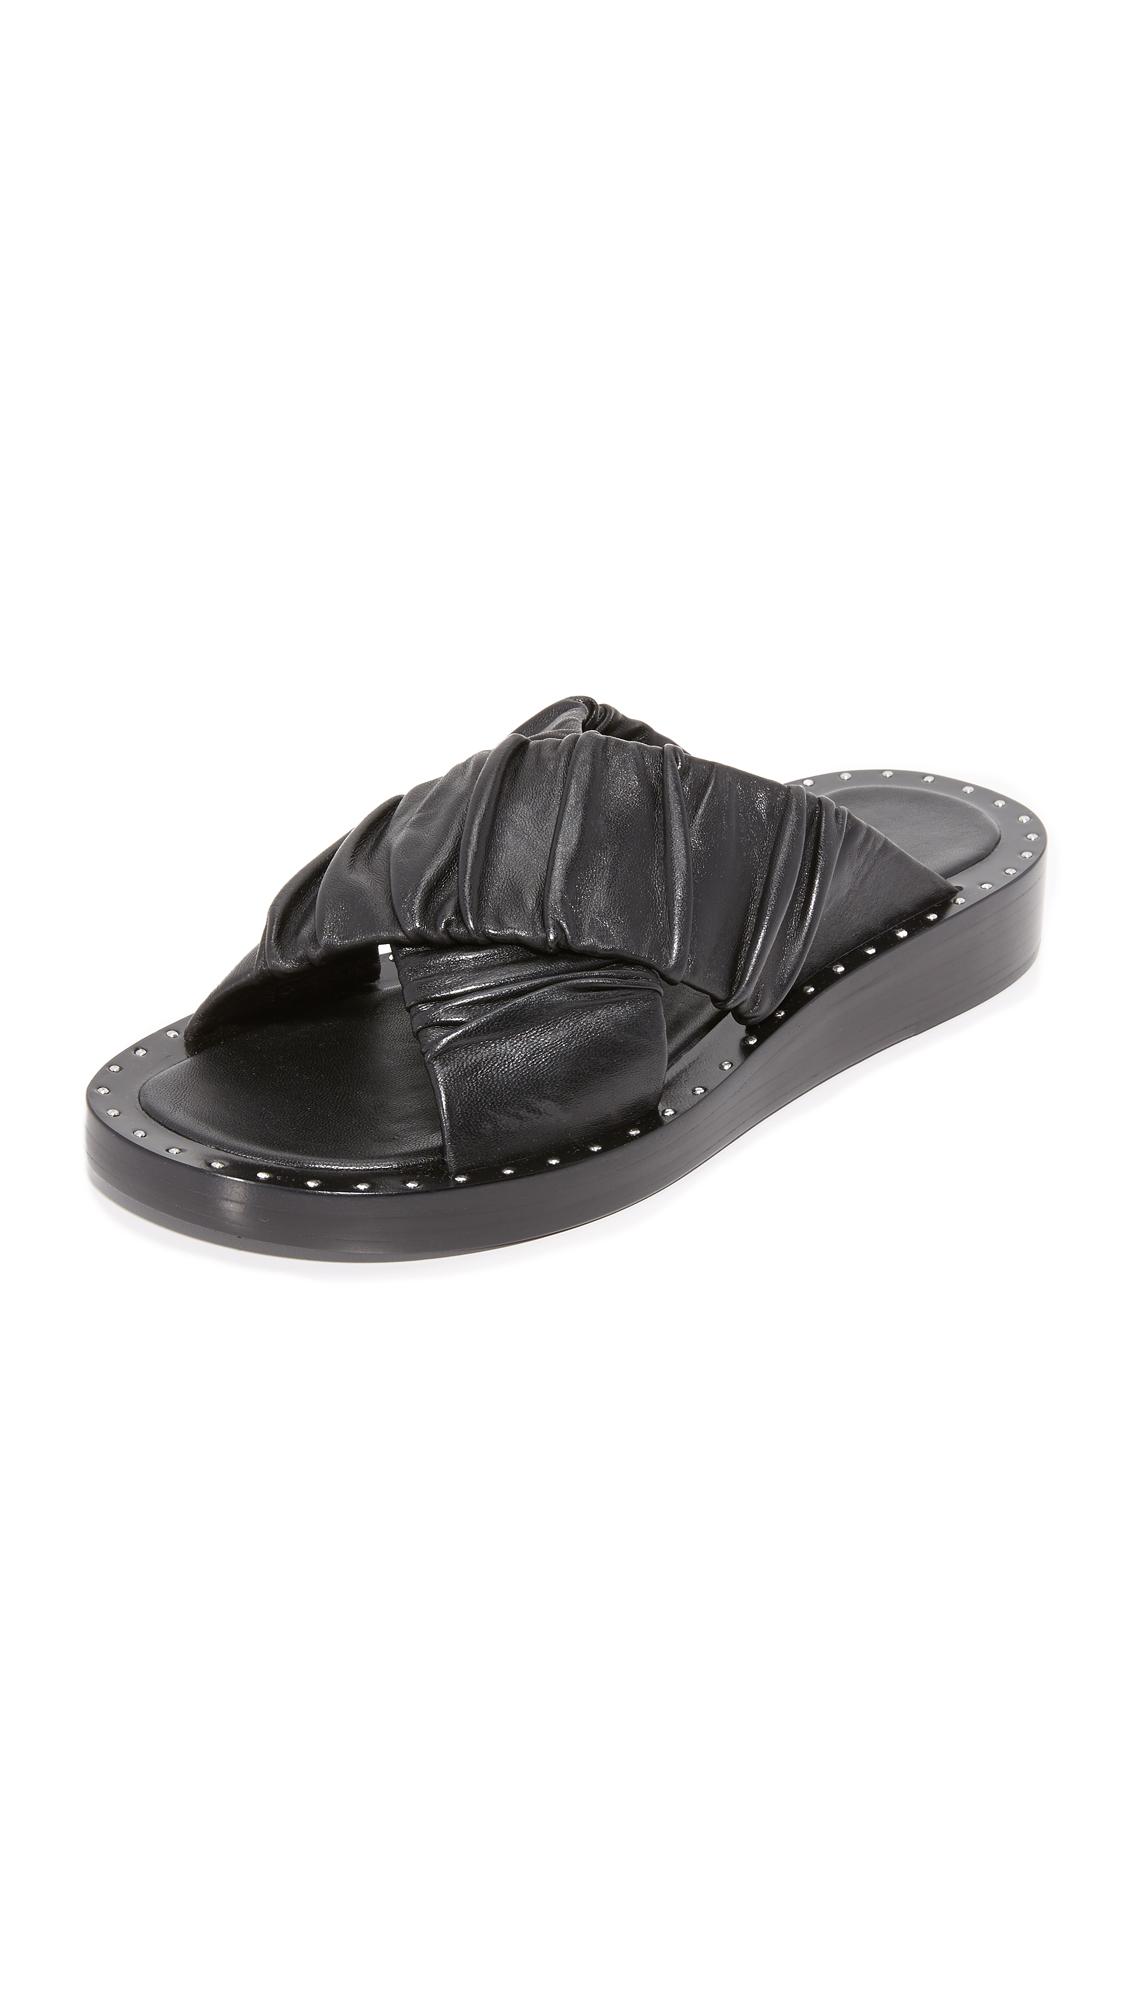 3.1 Phillip Lim Nagano Crisscross Slides - Black at Shopbop